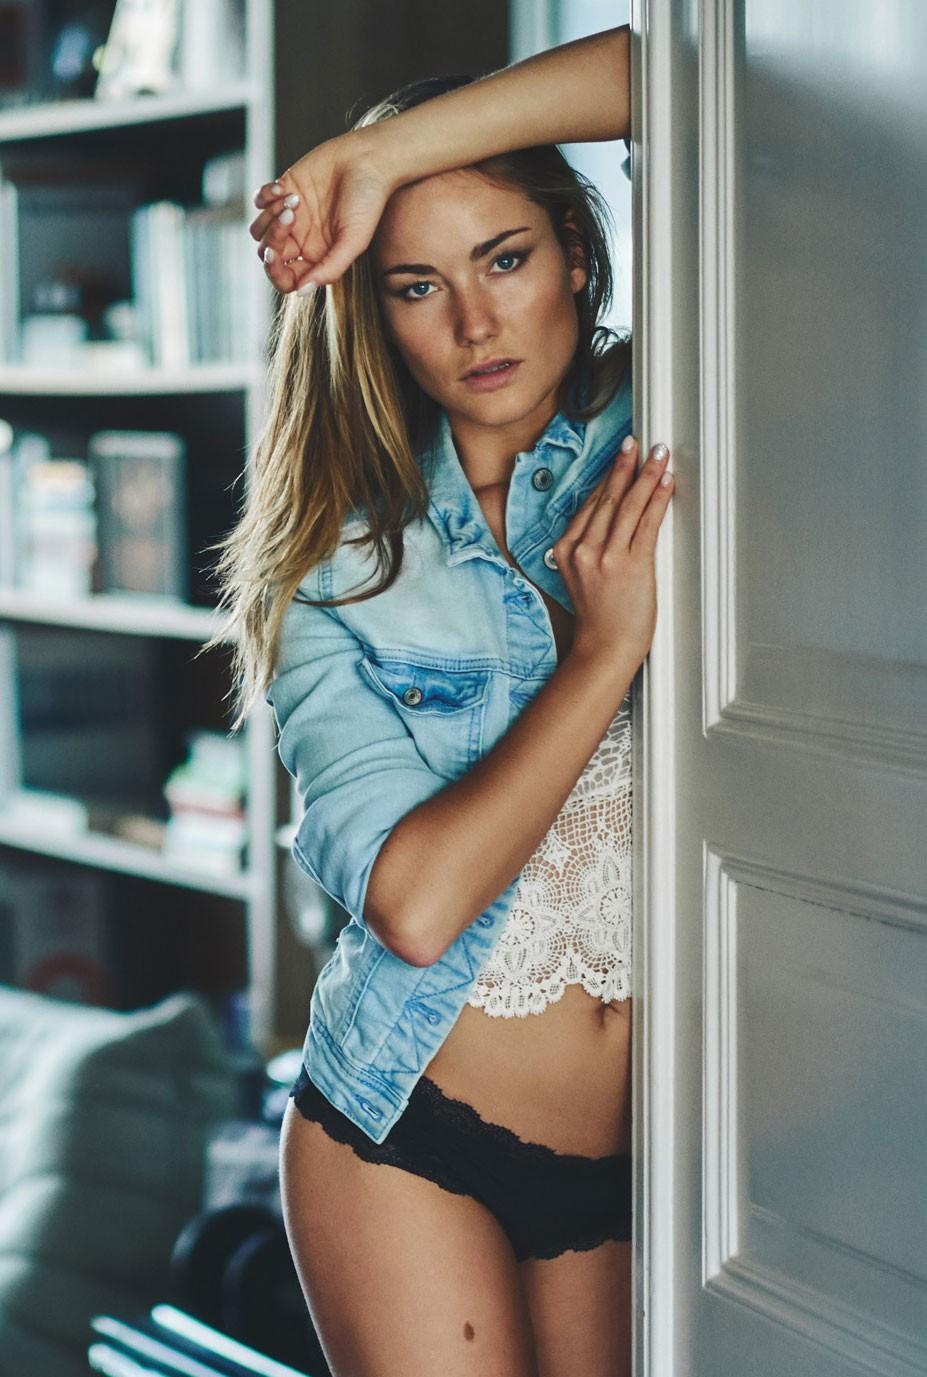 голубая джинсовая куртка - Шерил де Йонг / Sherelle de Jong by Michel Verpoorten - Blue still blue